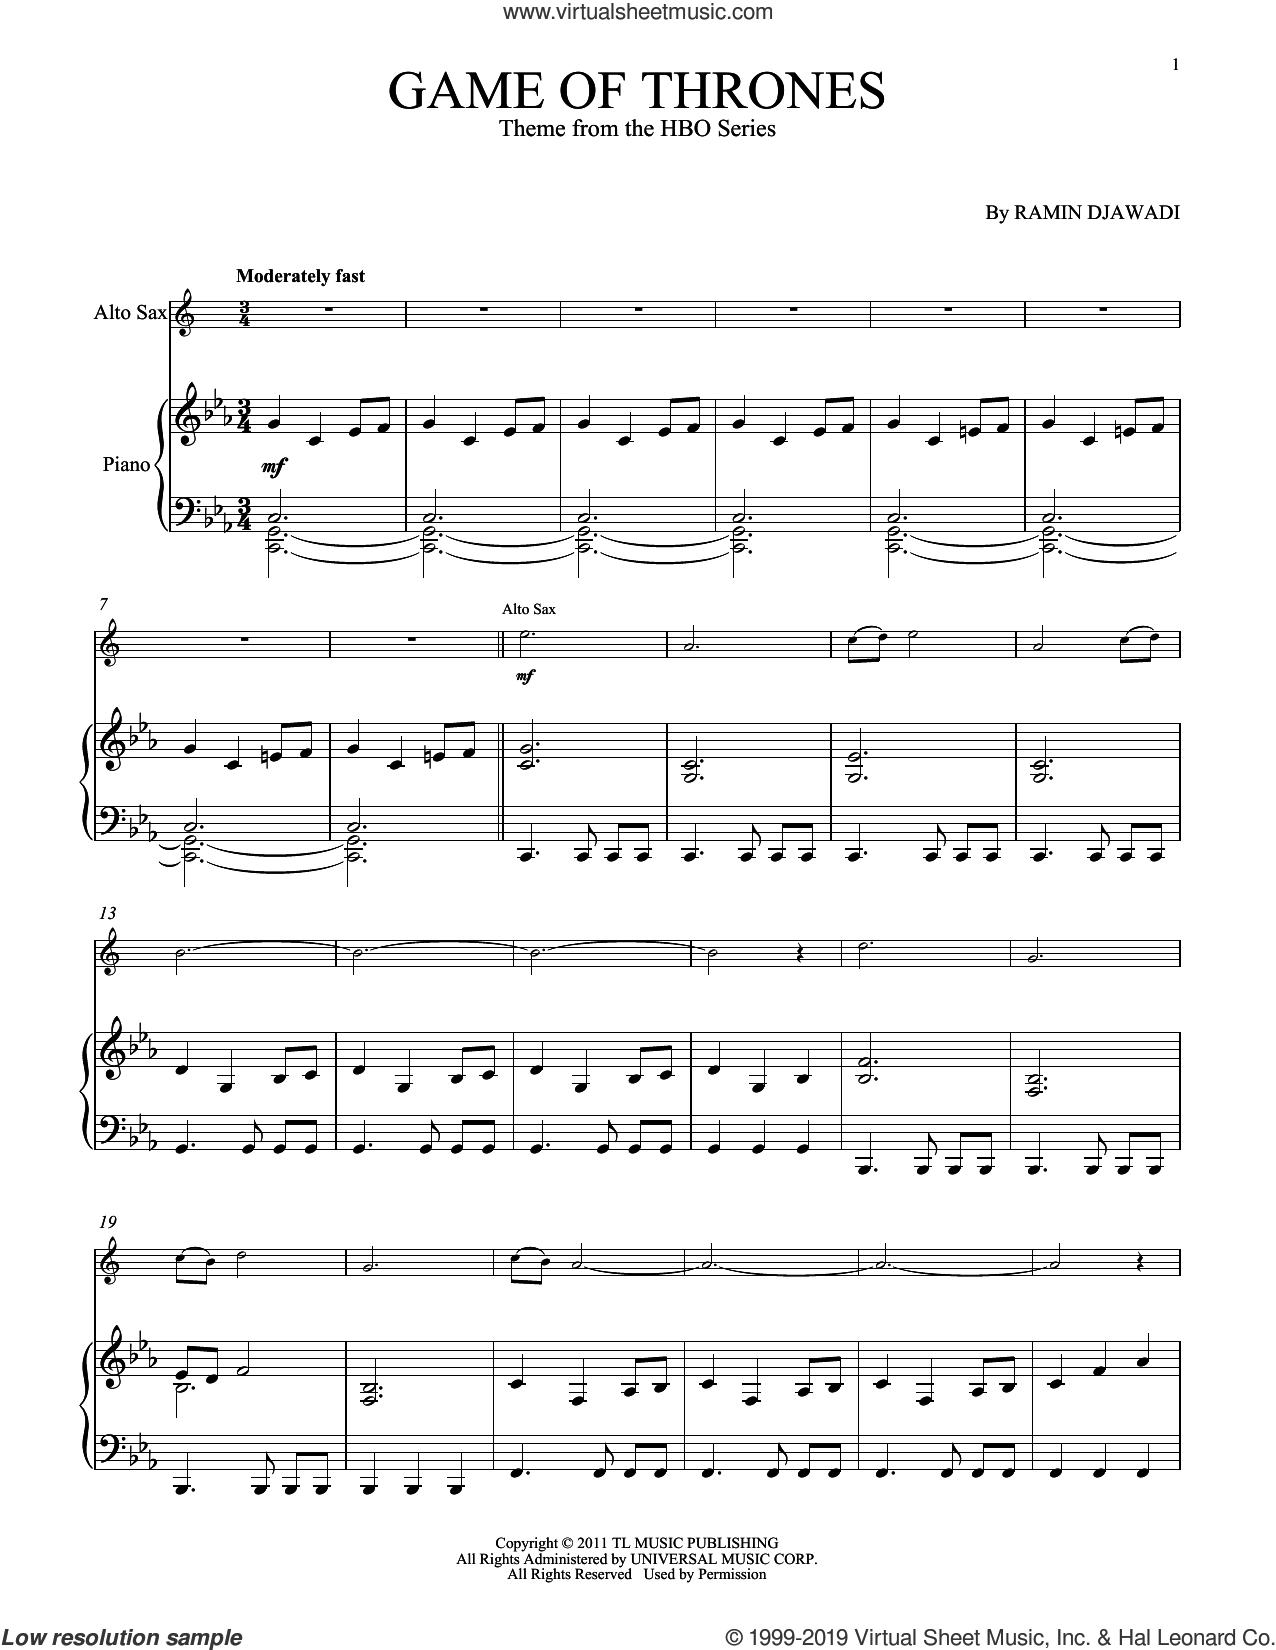 Game Of Thrones sheet music for alto saxophone and piano by Ramin Djawadi, intermediate skill level